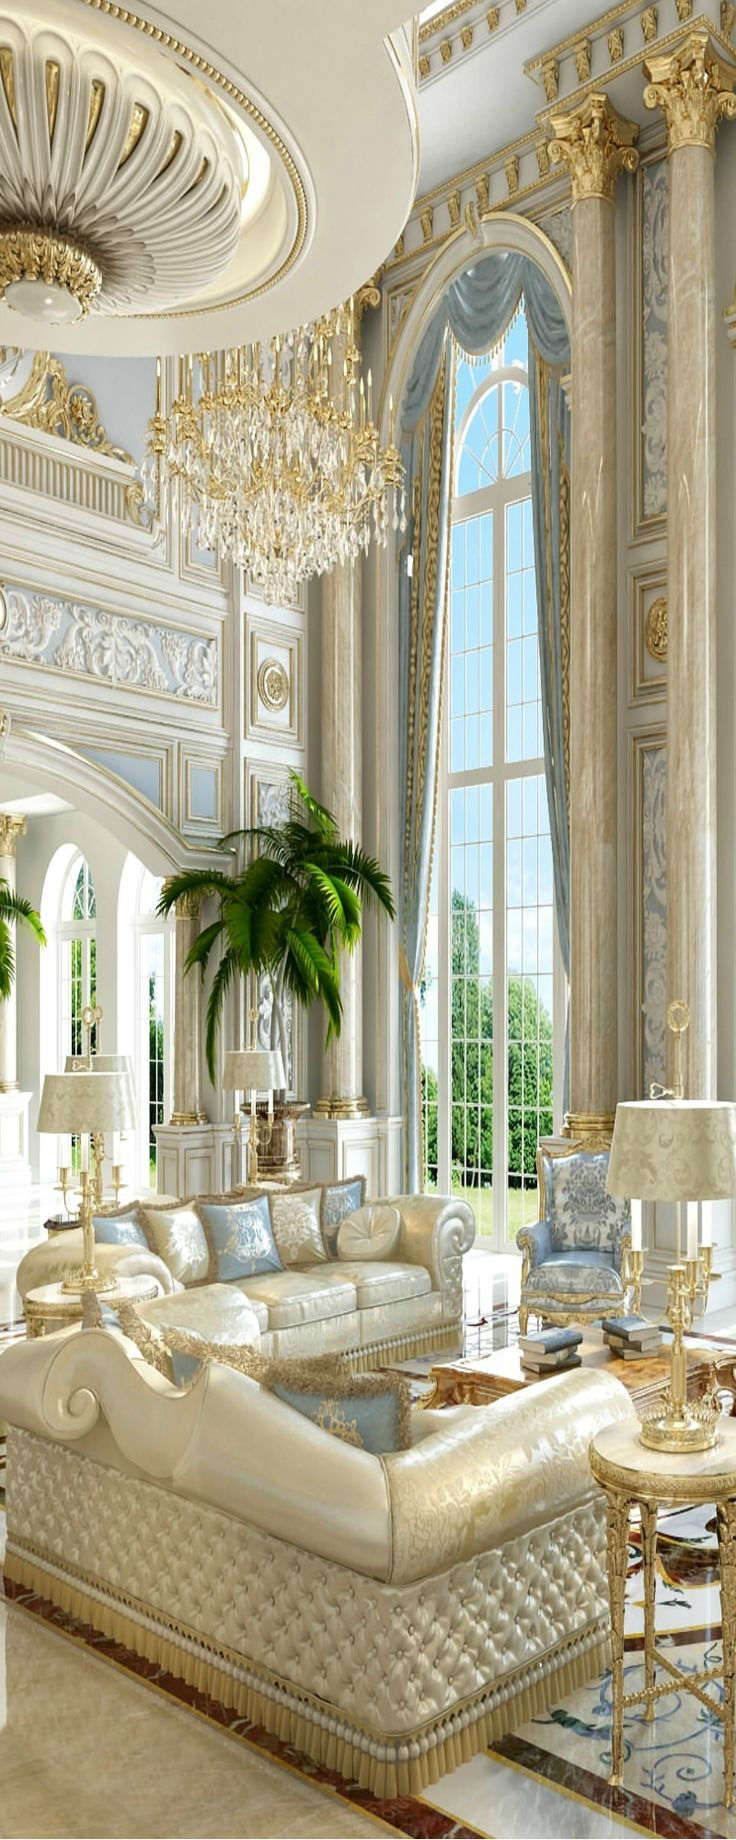 Interior Design: Interior Home Design Luxury. Best Luxury Designer Ideas Dream Wallpaper Interior Home Design Luxury For Style Pc Hd